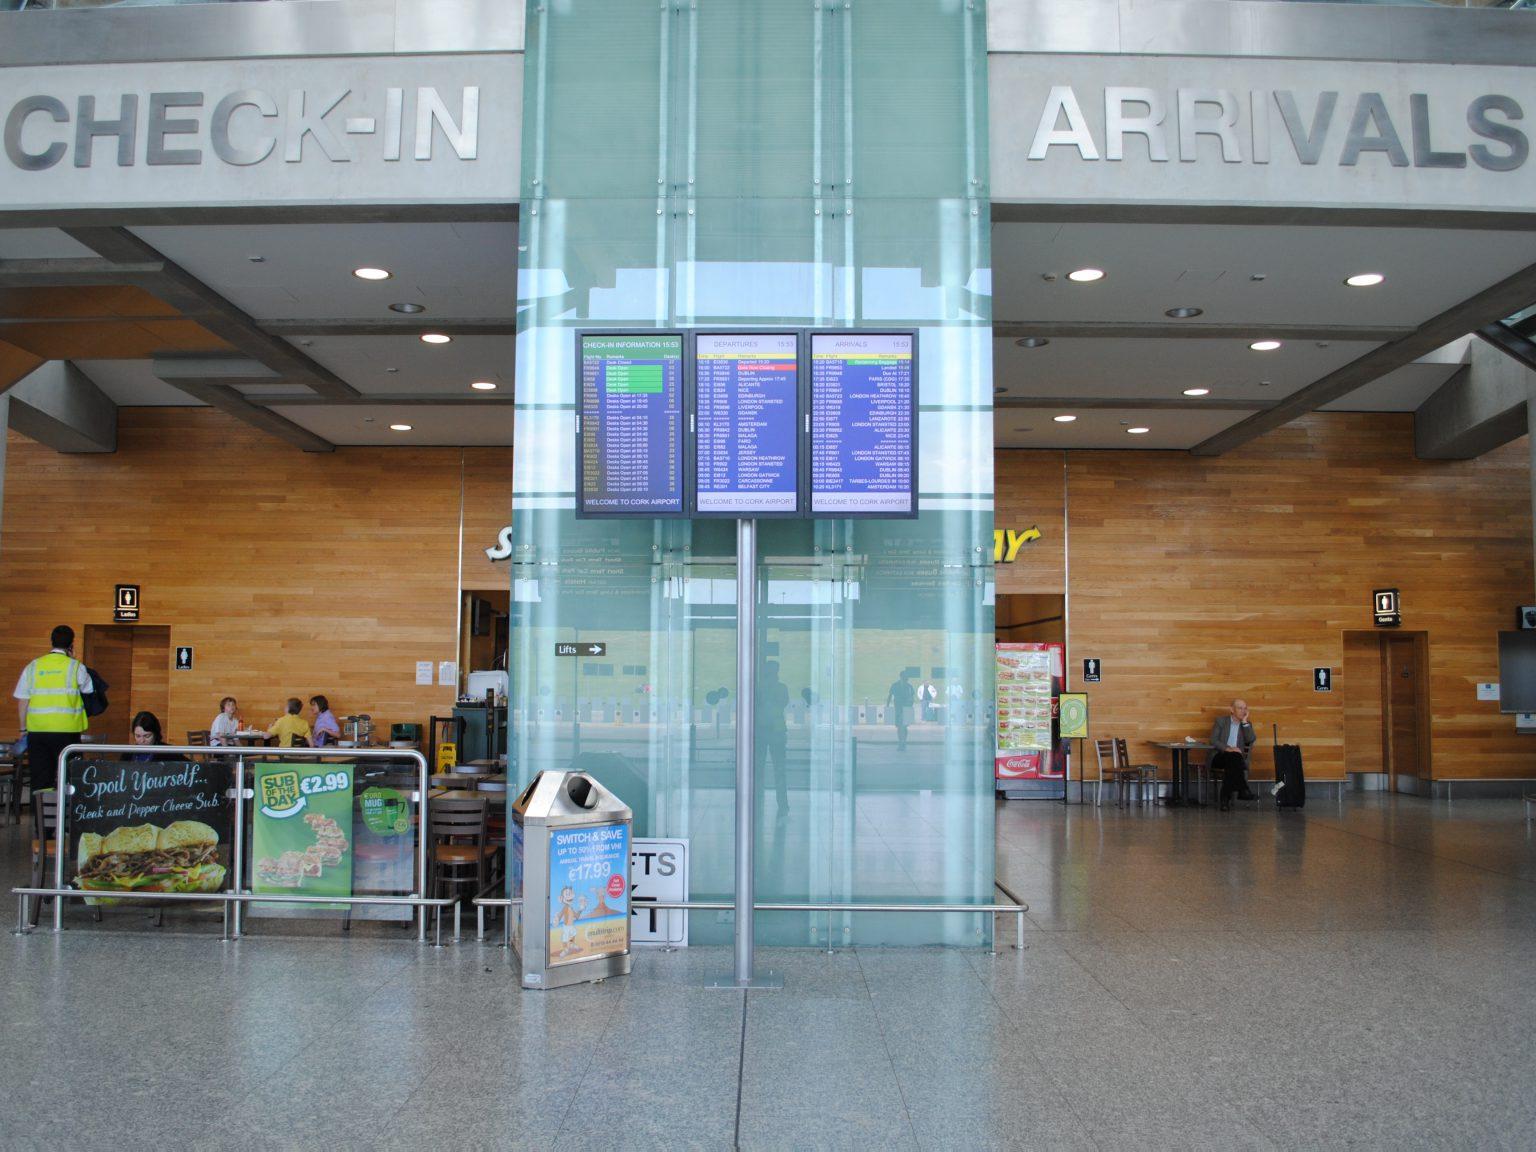 Flight information displays at Cork Airport